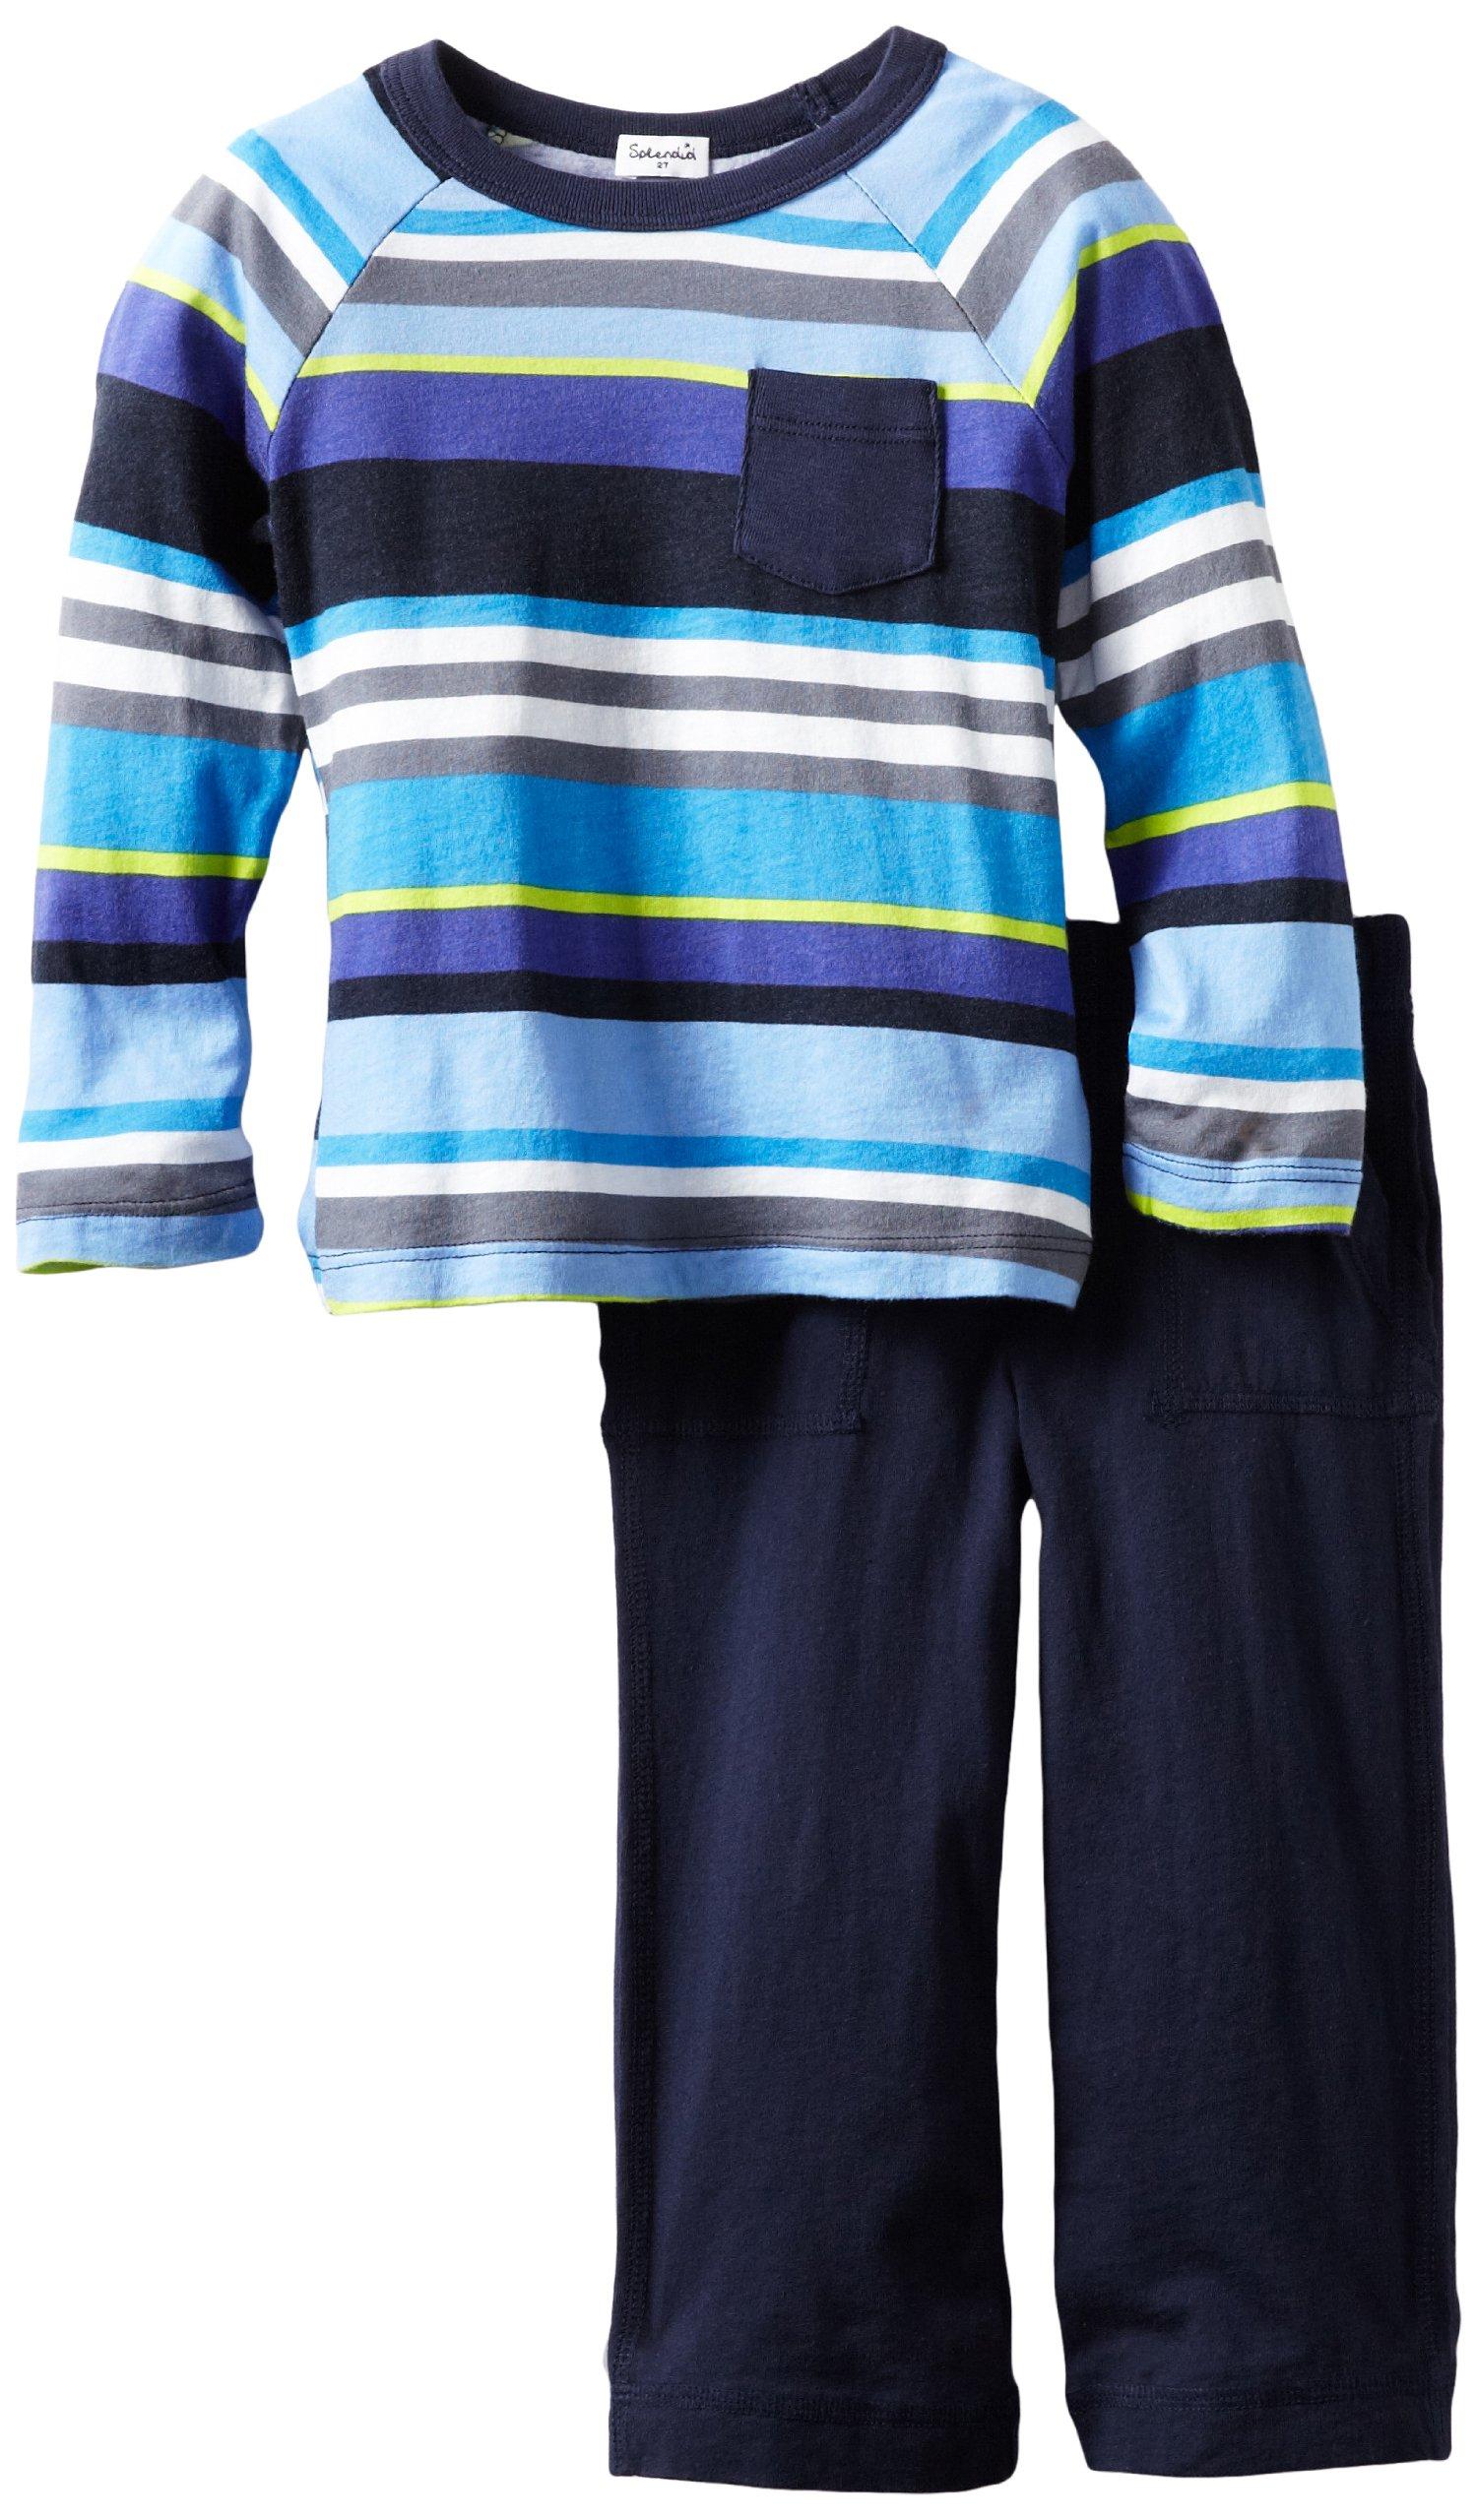 Splendid Littles Little Boys' Pensacola Stripe Raglan Set, Wave Jumper, 2T